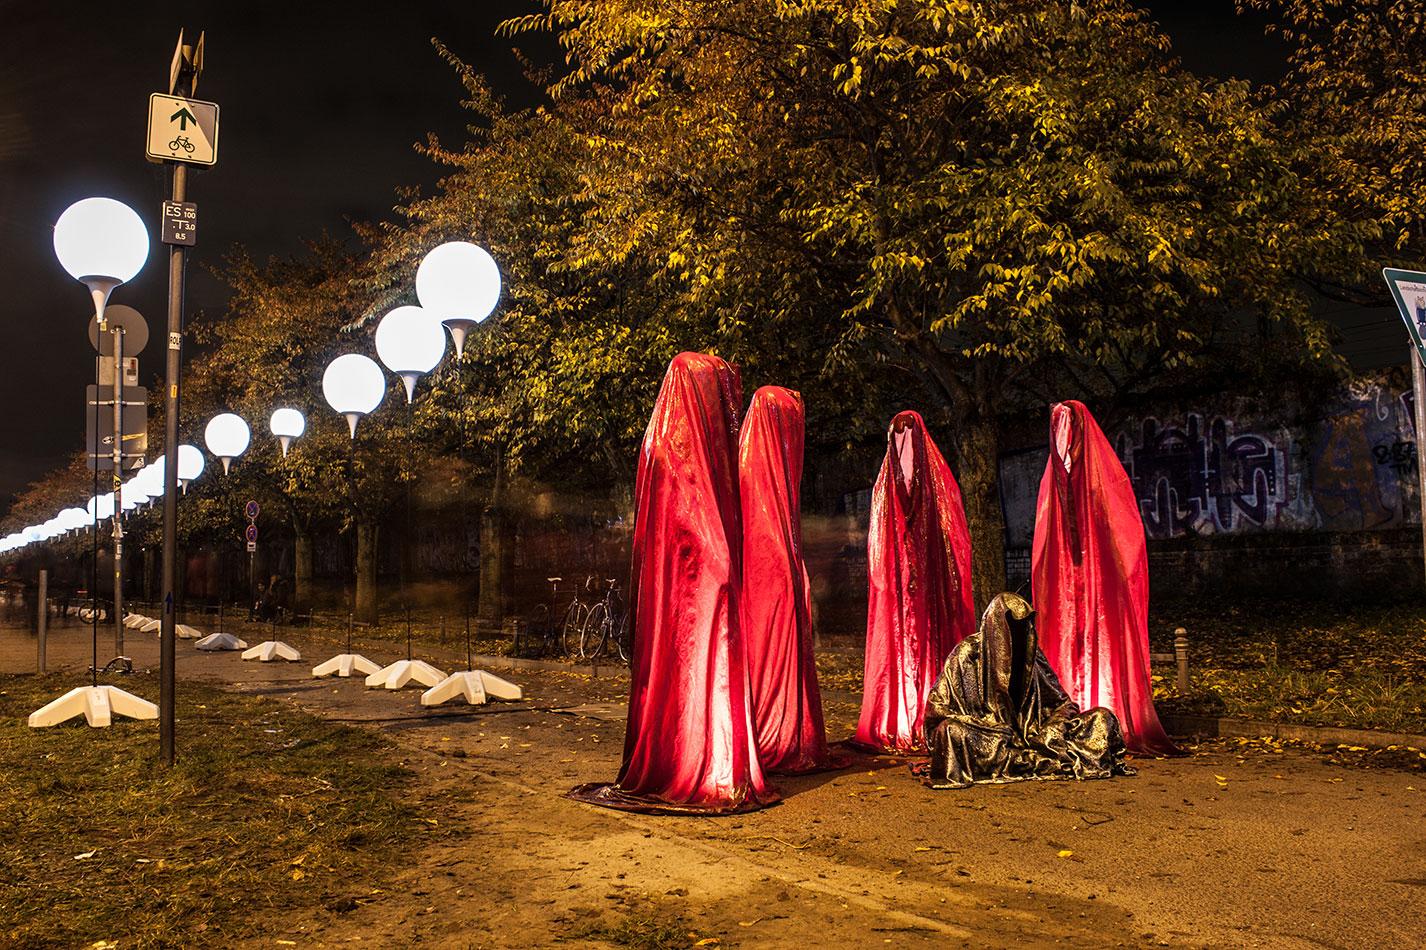 25-jears-wallfall-berlin-germany-contemporary-fine-art-show-arts-design-guardians-of-time-manfred-kili-kielnhofer-4330